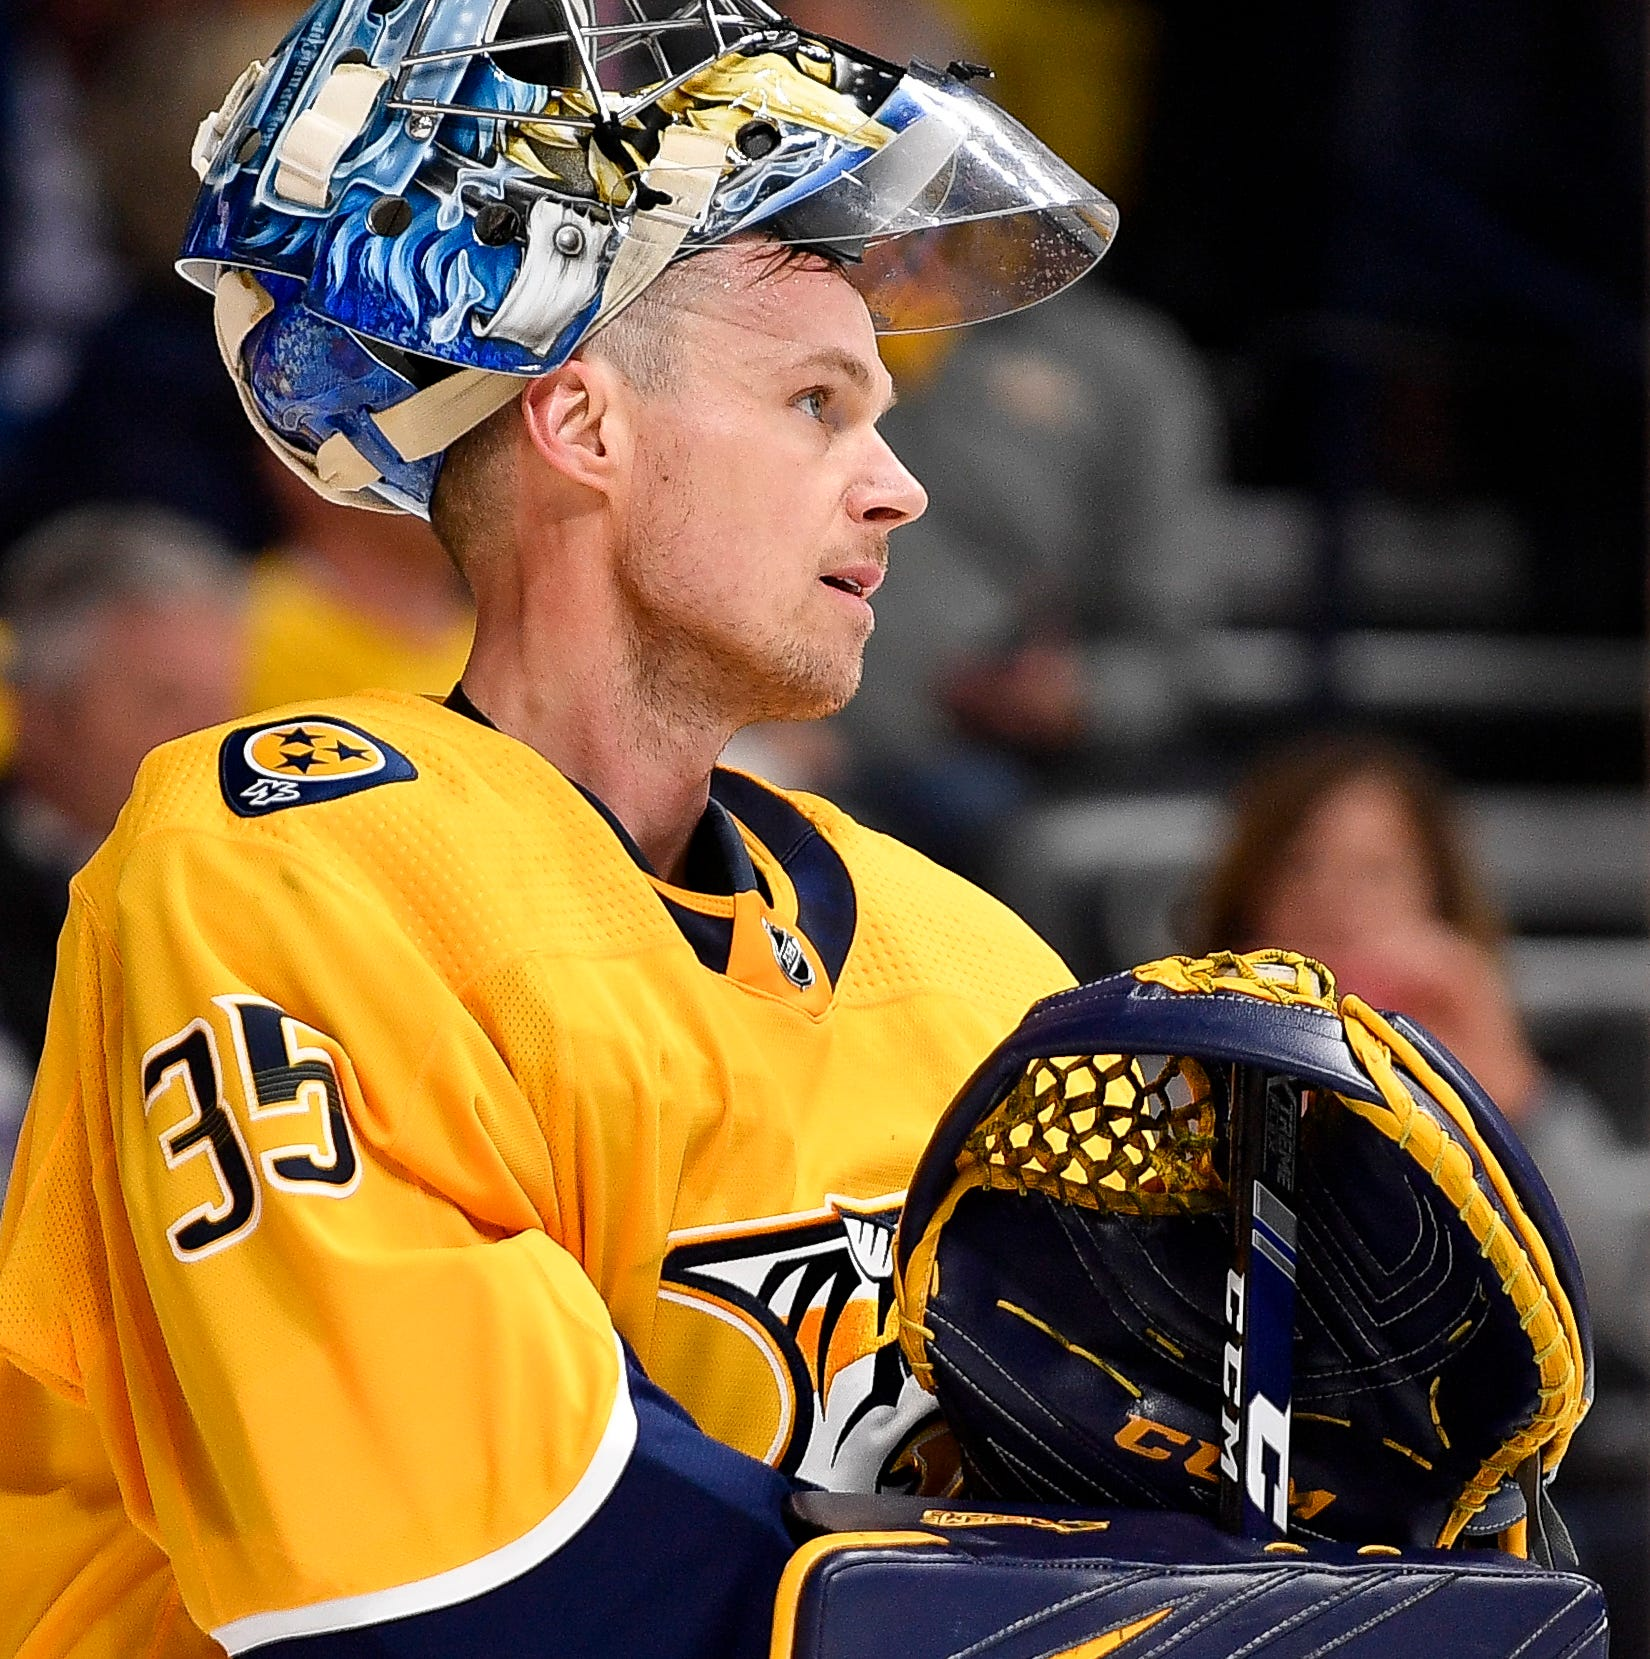 If Predators make a run in NHL playoffs, Pekka Rinne will be why